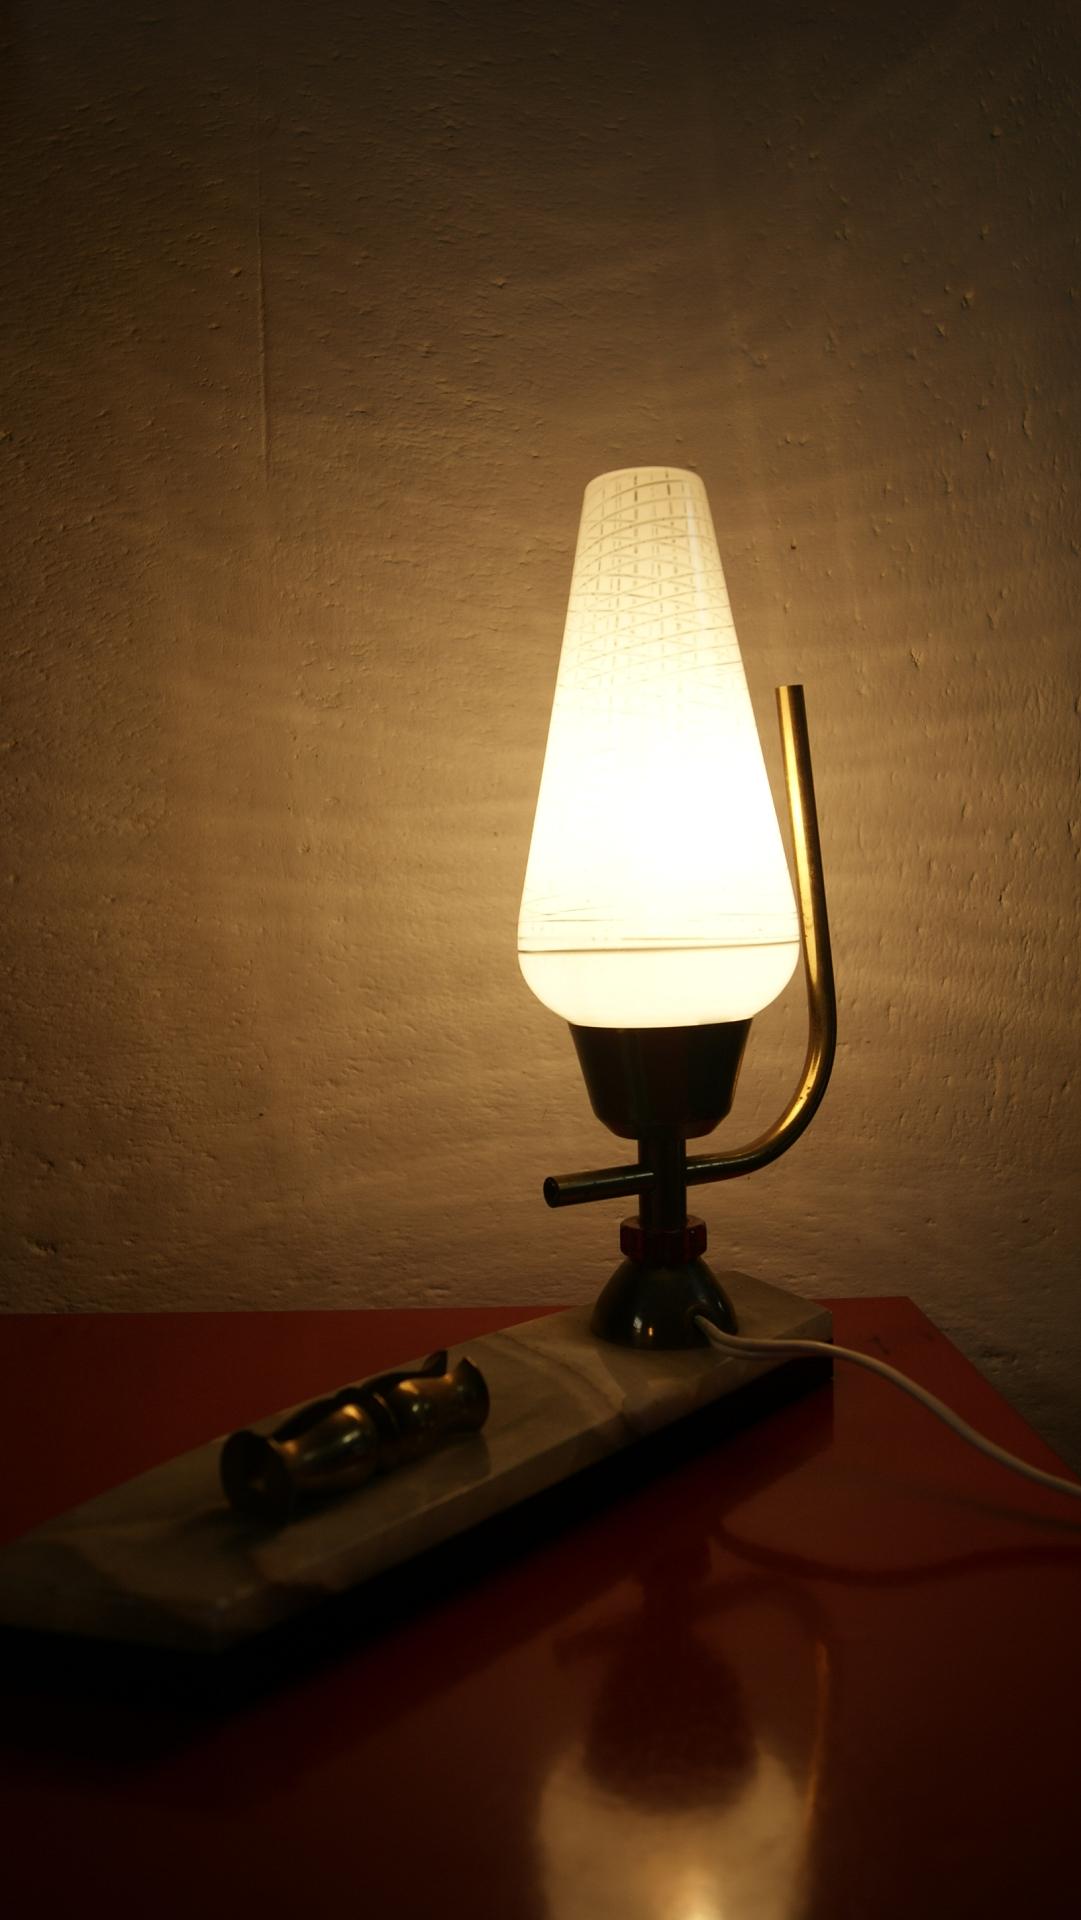 lampe poser art d co socle marbre et tulipe en verre. Black Bedroom Furniture Sets. Home Design Ideas